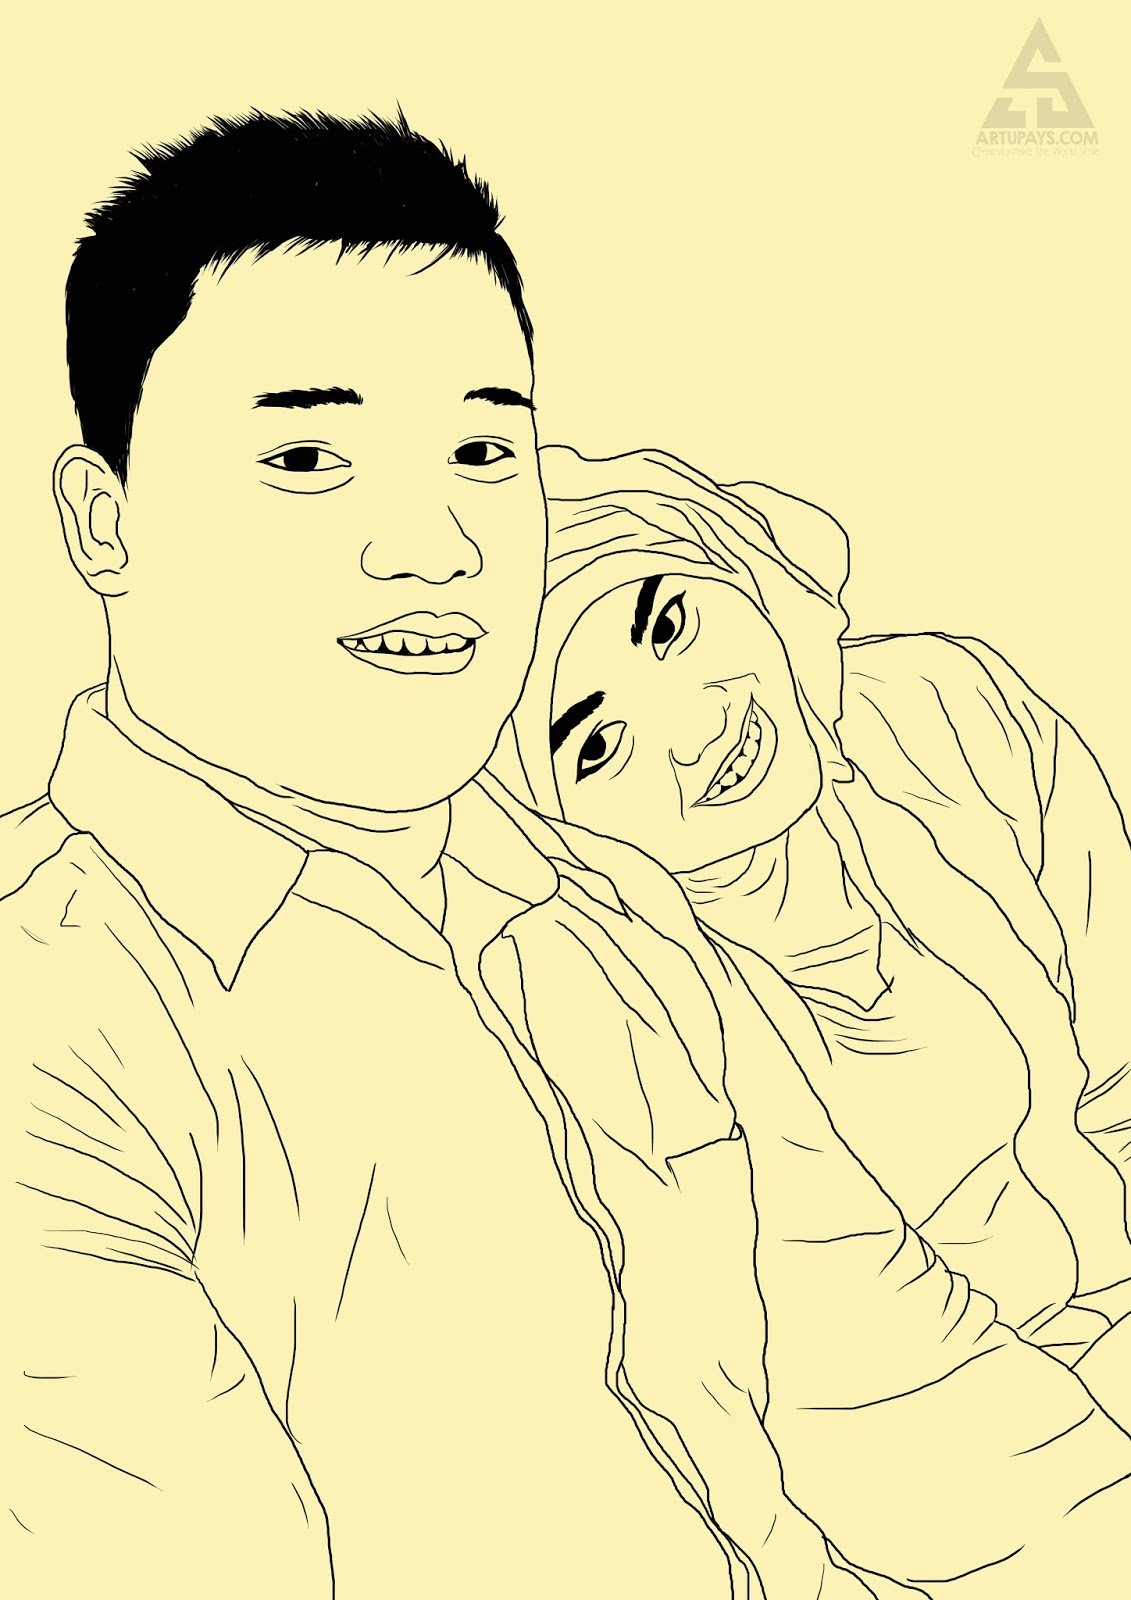 Line Art Wajah : Line art pemenang artquiz artupays